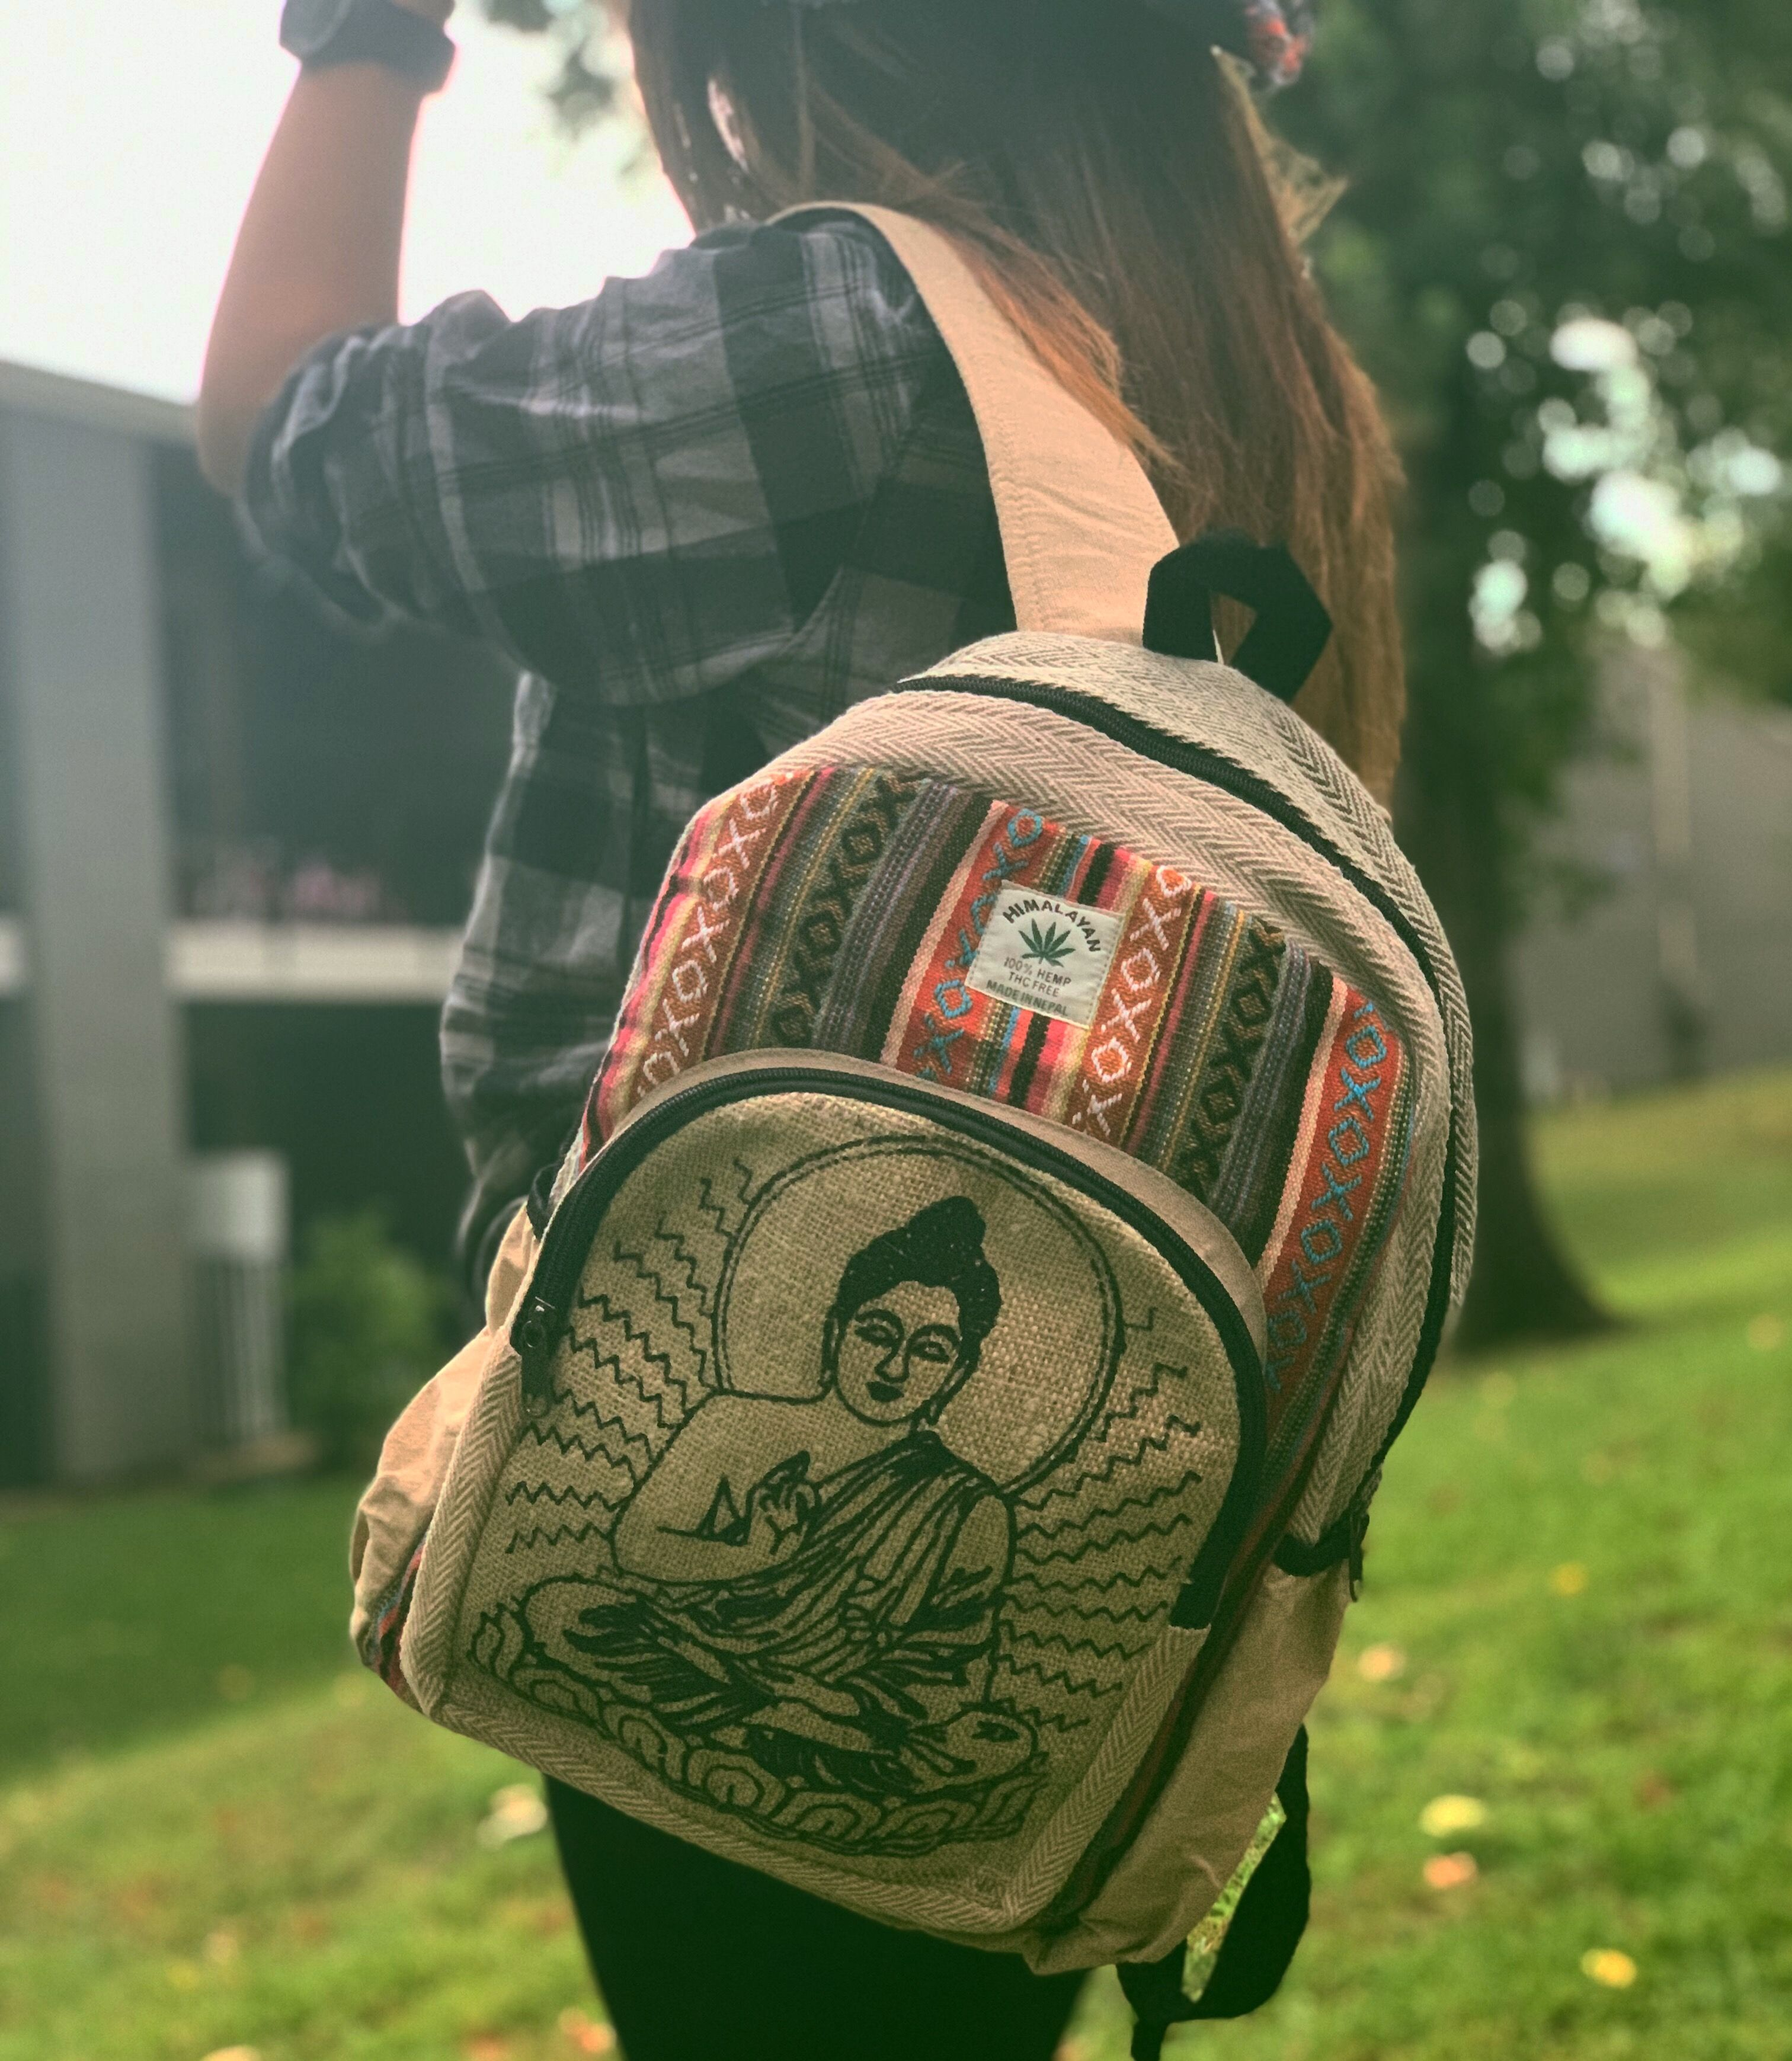 Hemp Backpack-Hippies Bag-Handmade Hemp Bag-Eco friendly laptop bag-school bag